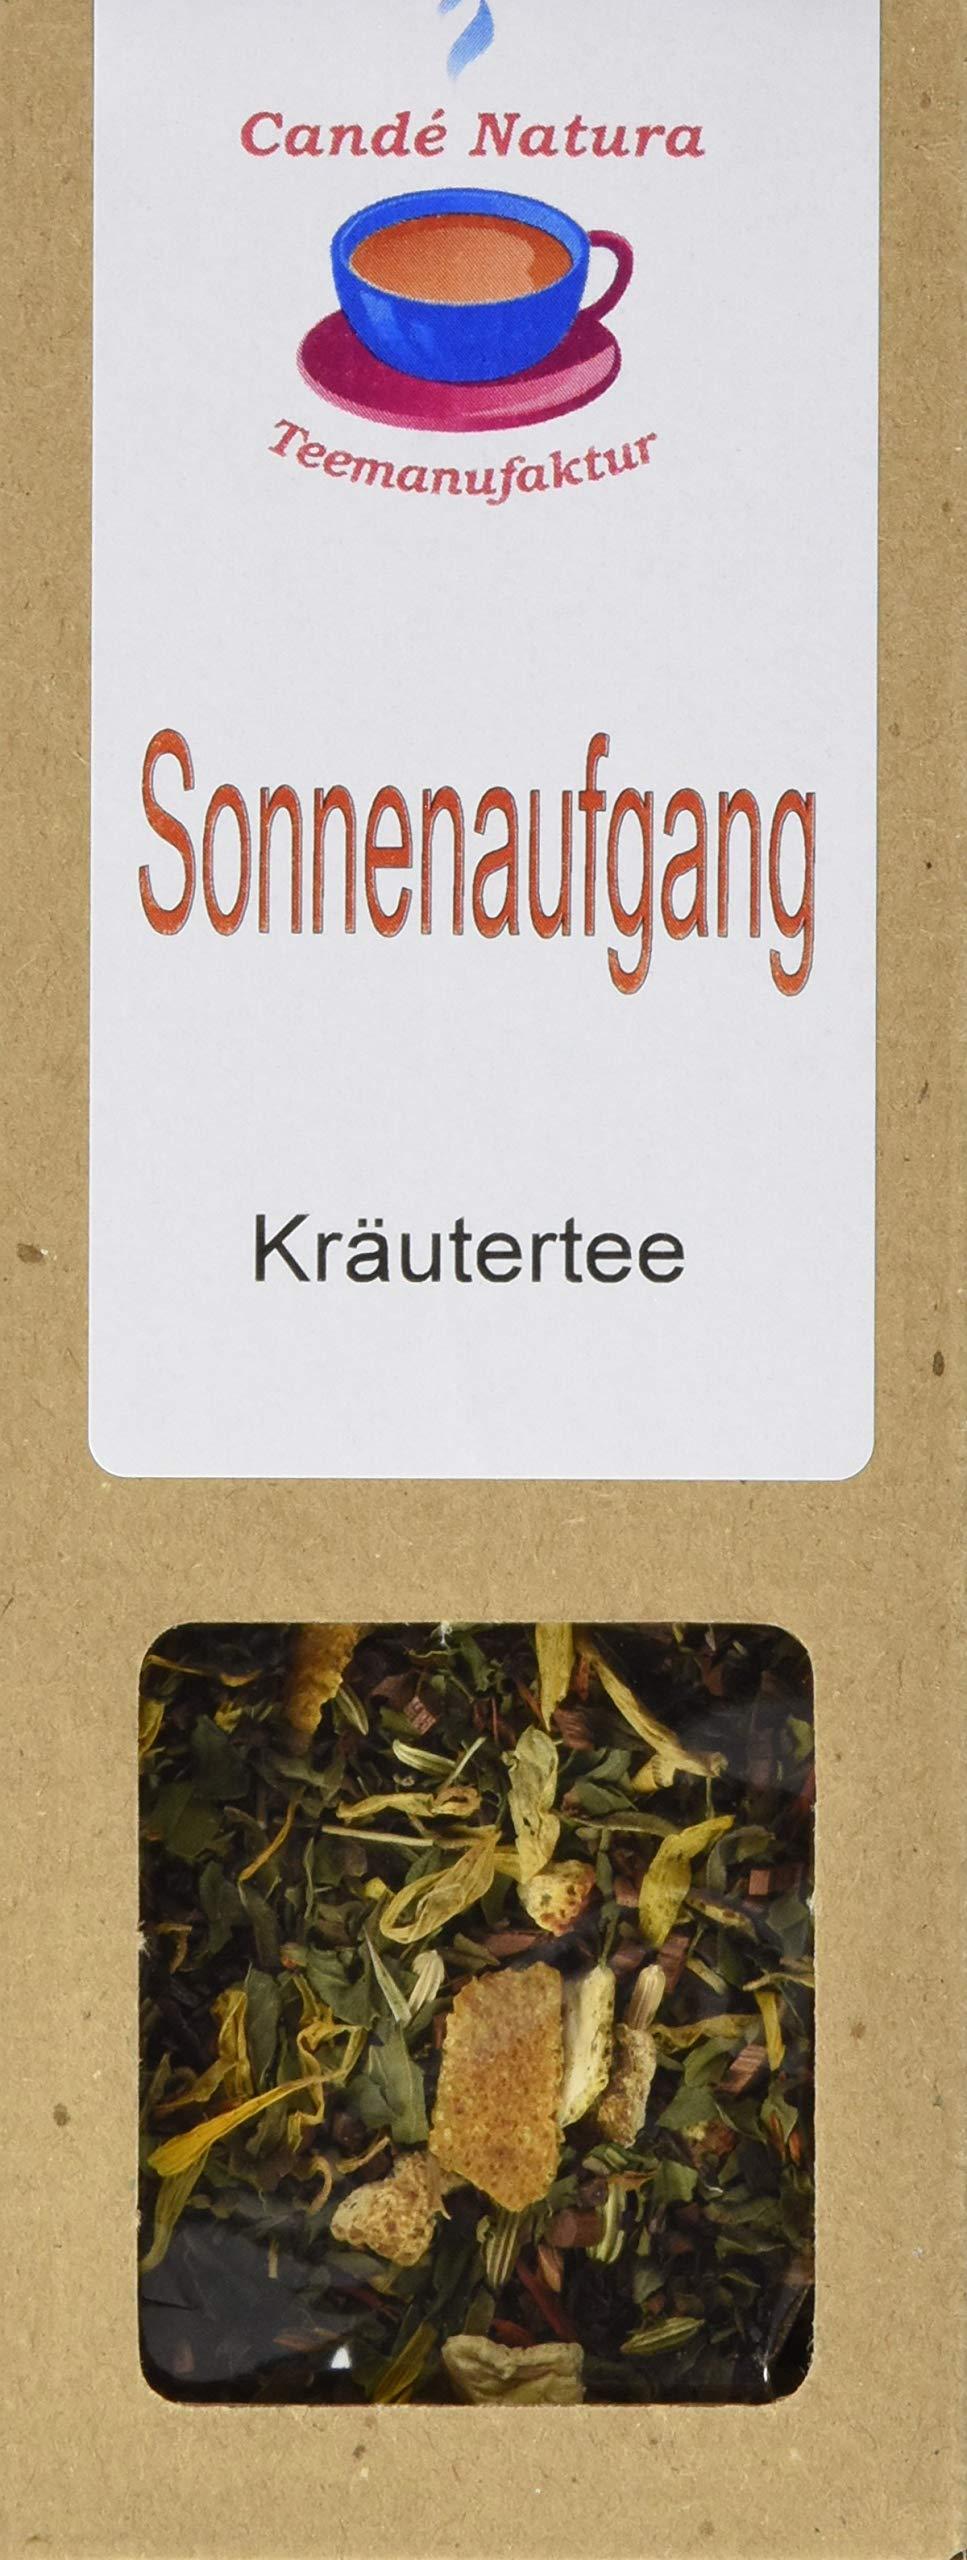 Cand-Natura-Teemanufaktur-Sonnenaufgang-Kruterteemischung-5er-Pack-5-x-71-g